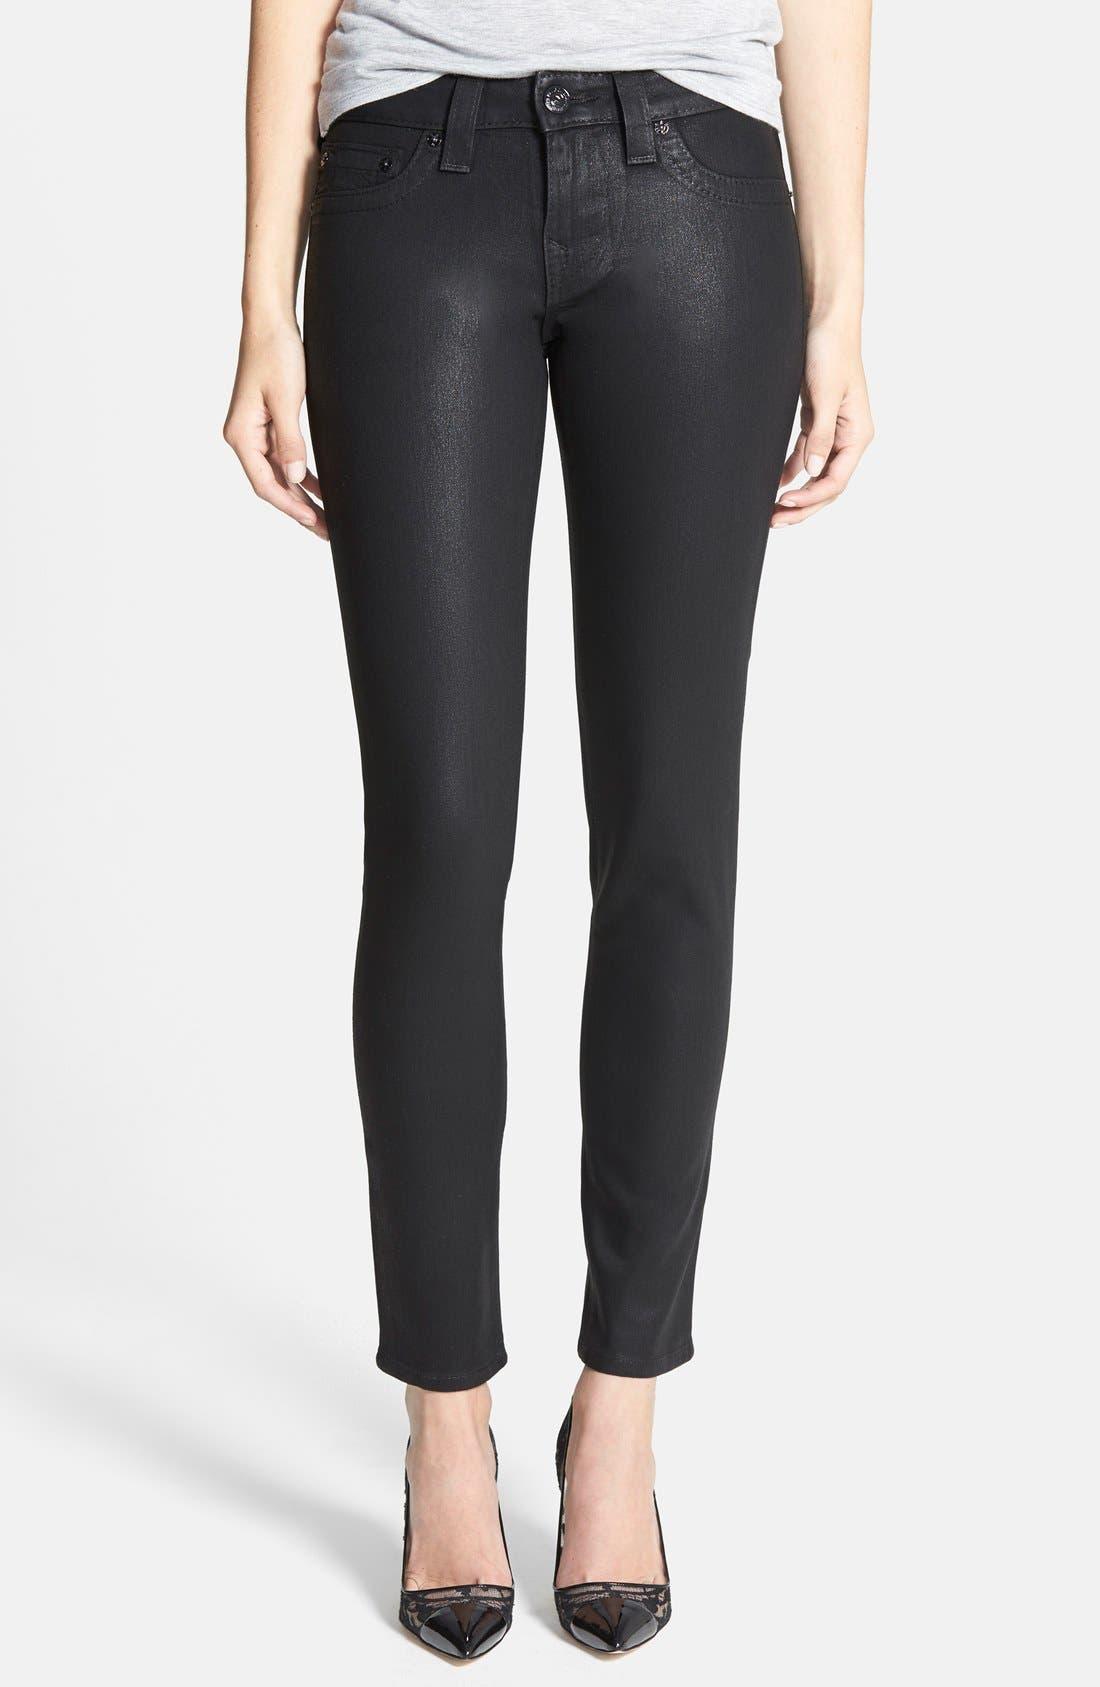 Alternate Image 1 Selected - True Religion Brand Jeans 'Halle - Super Vixen' Coated Skinny Jeans (Black)